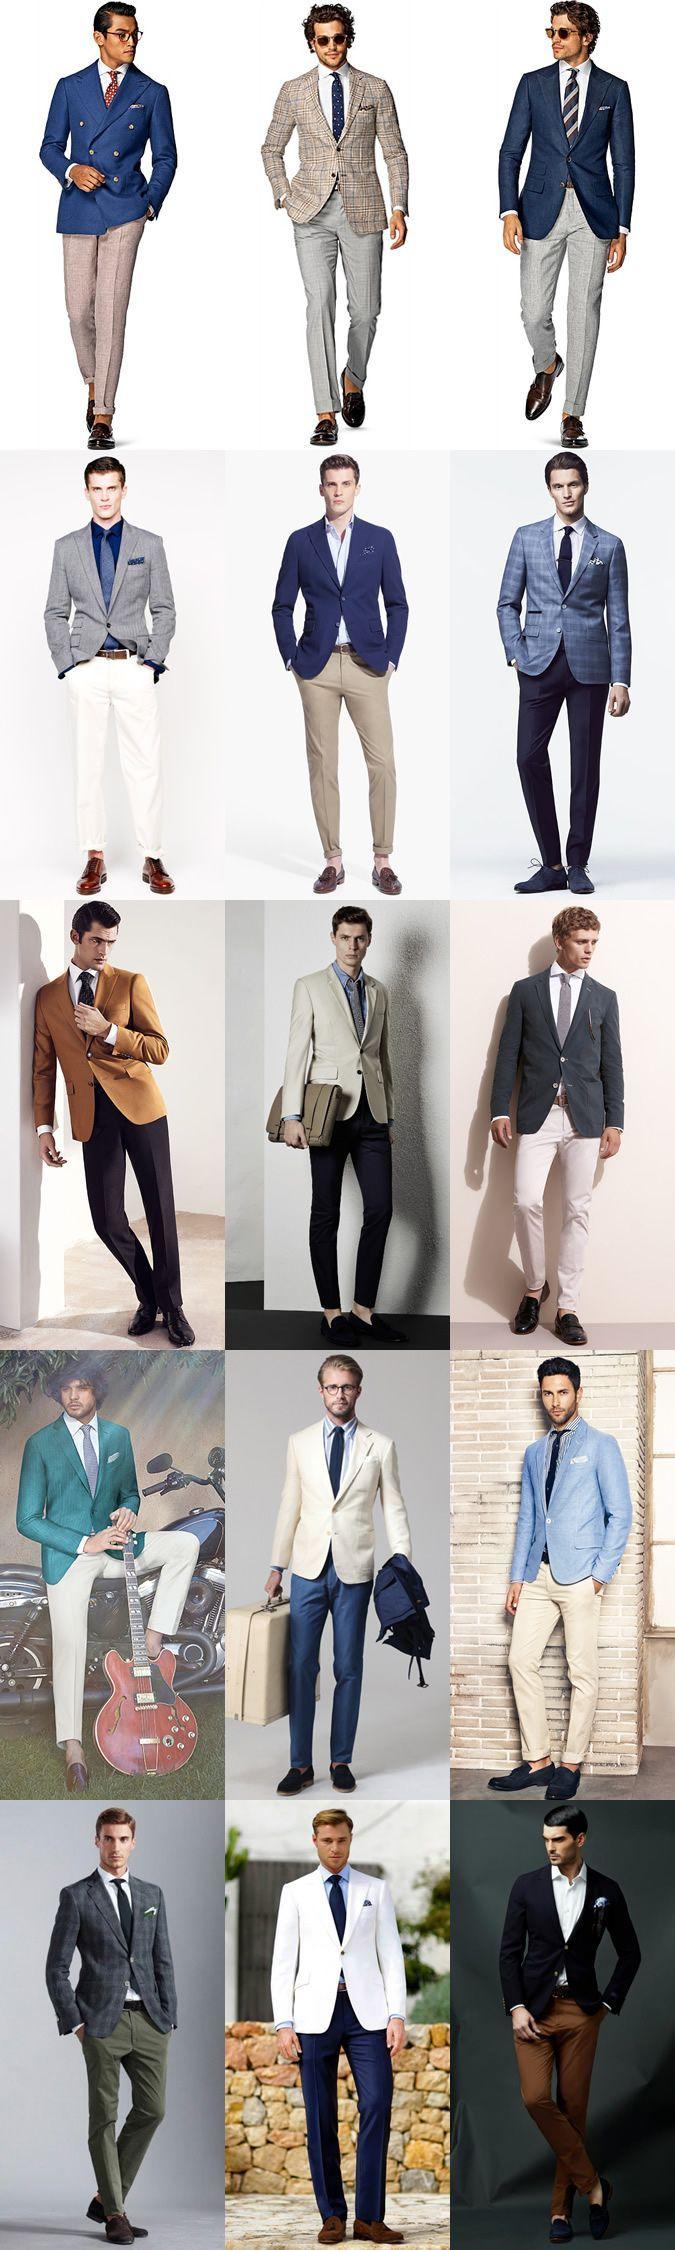 Men's Summer Weddings Smart-Casual Separates Outfit Inspiration Lookbook #MenSummerFashion